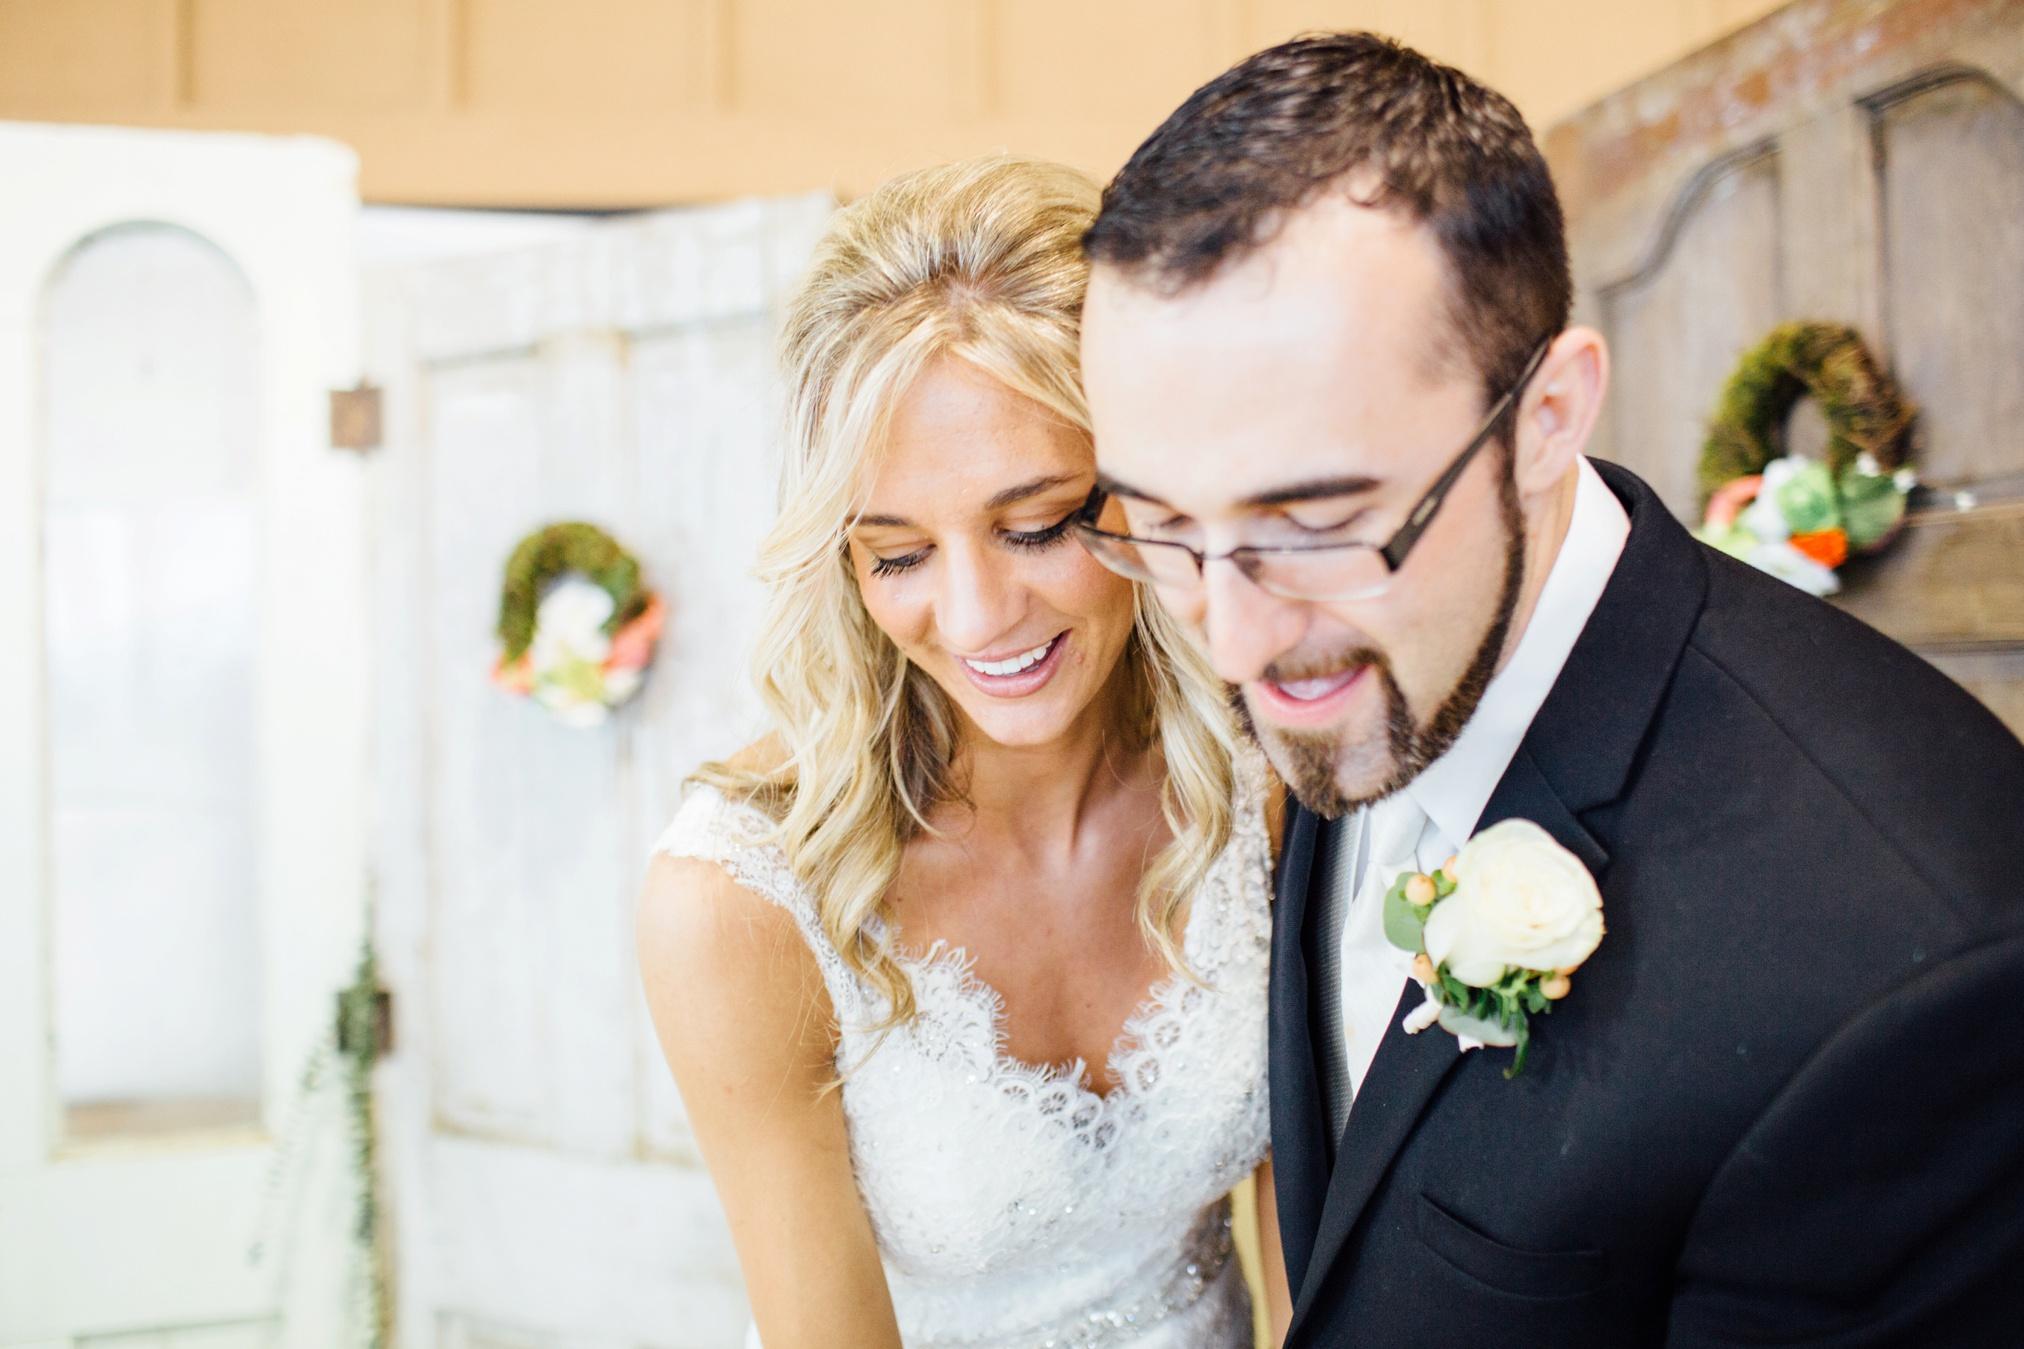 schmid_wedding-750.jpg